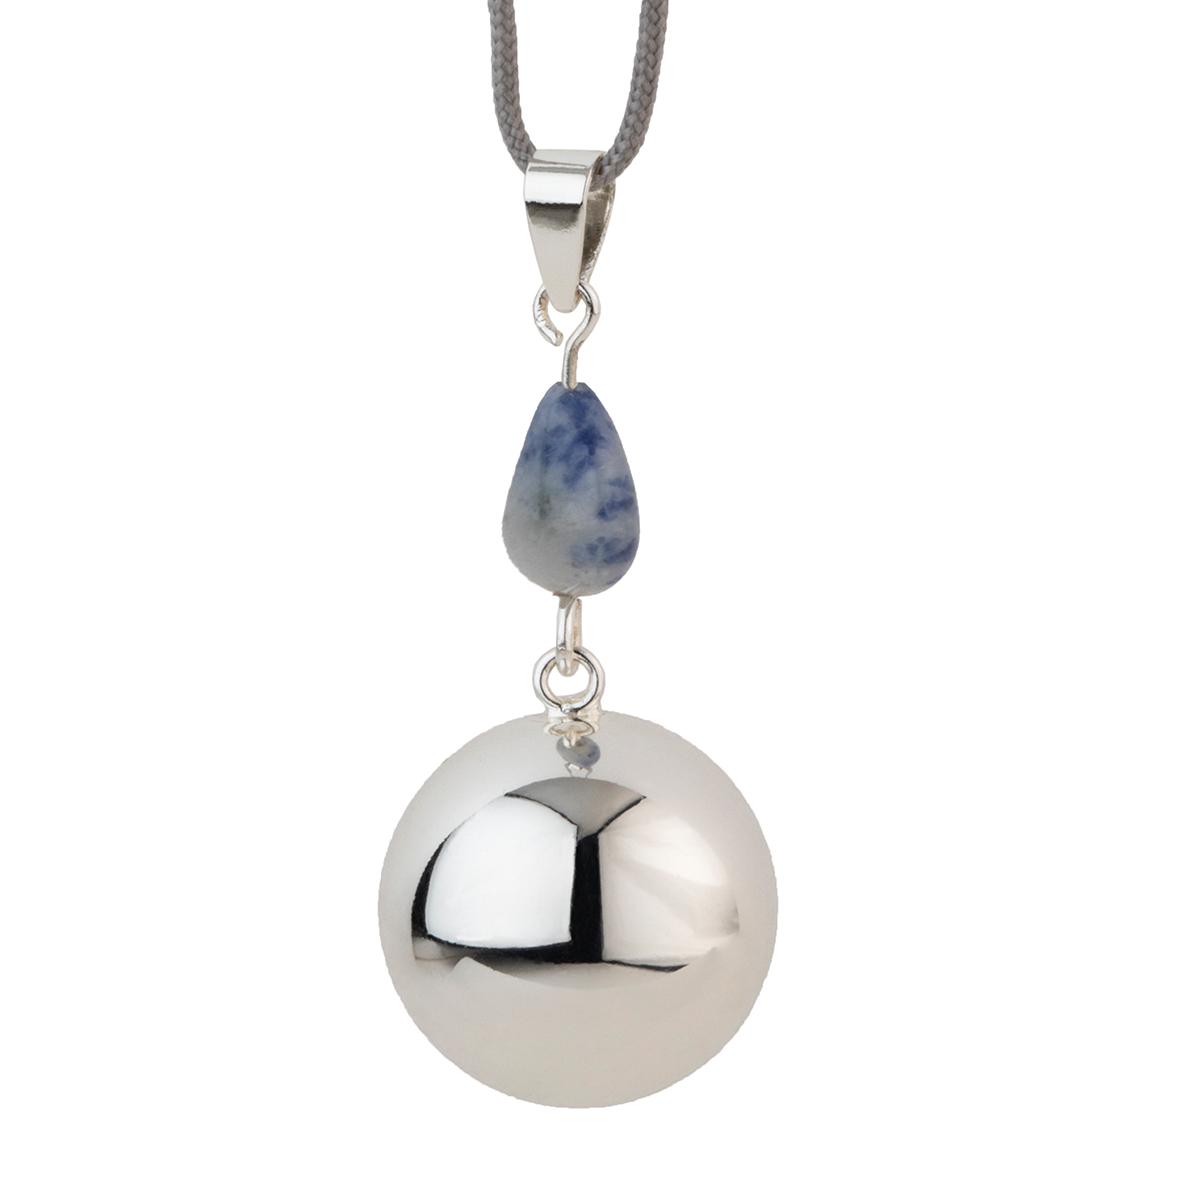 Bola silver blue stone